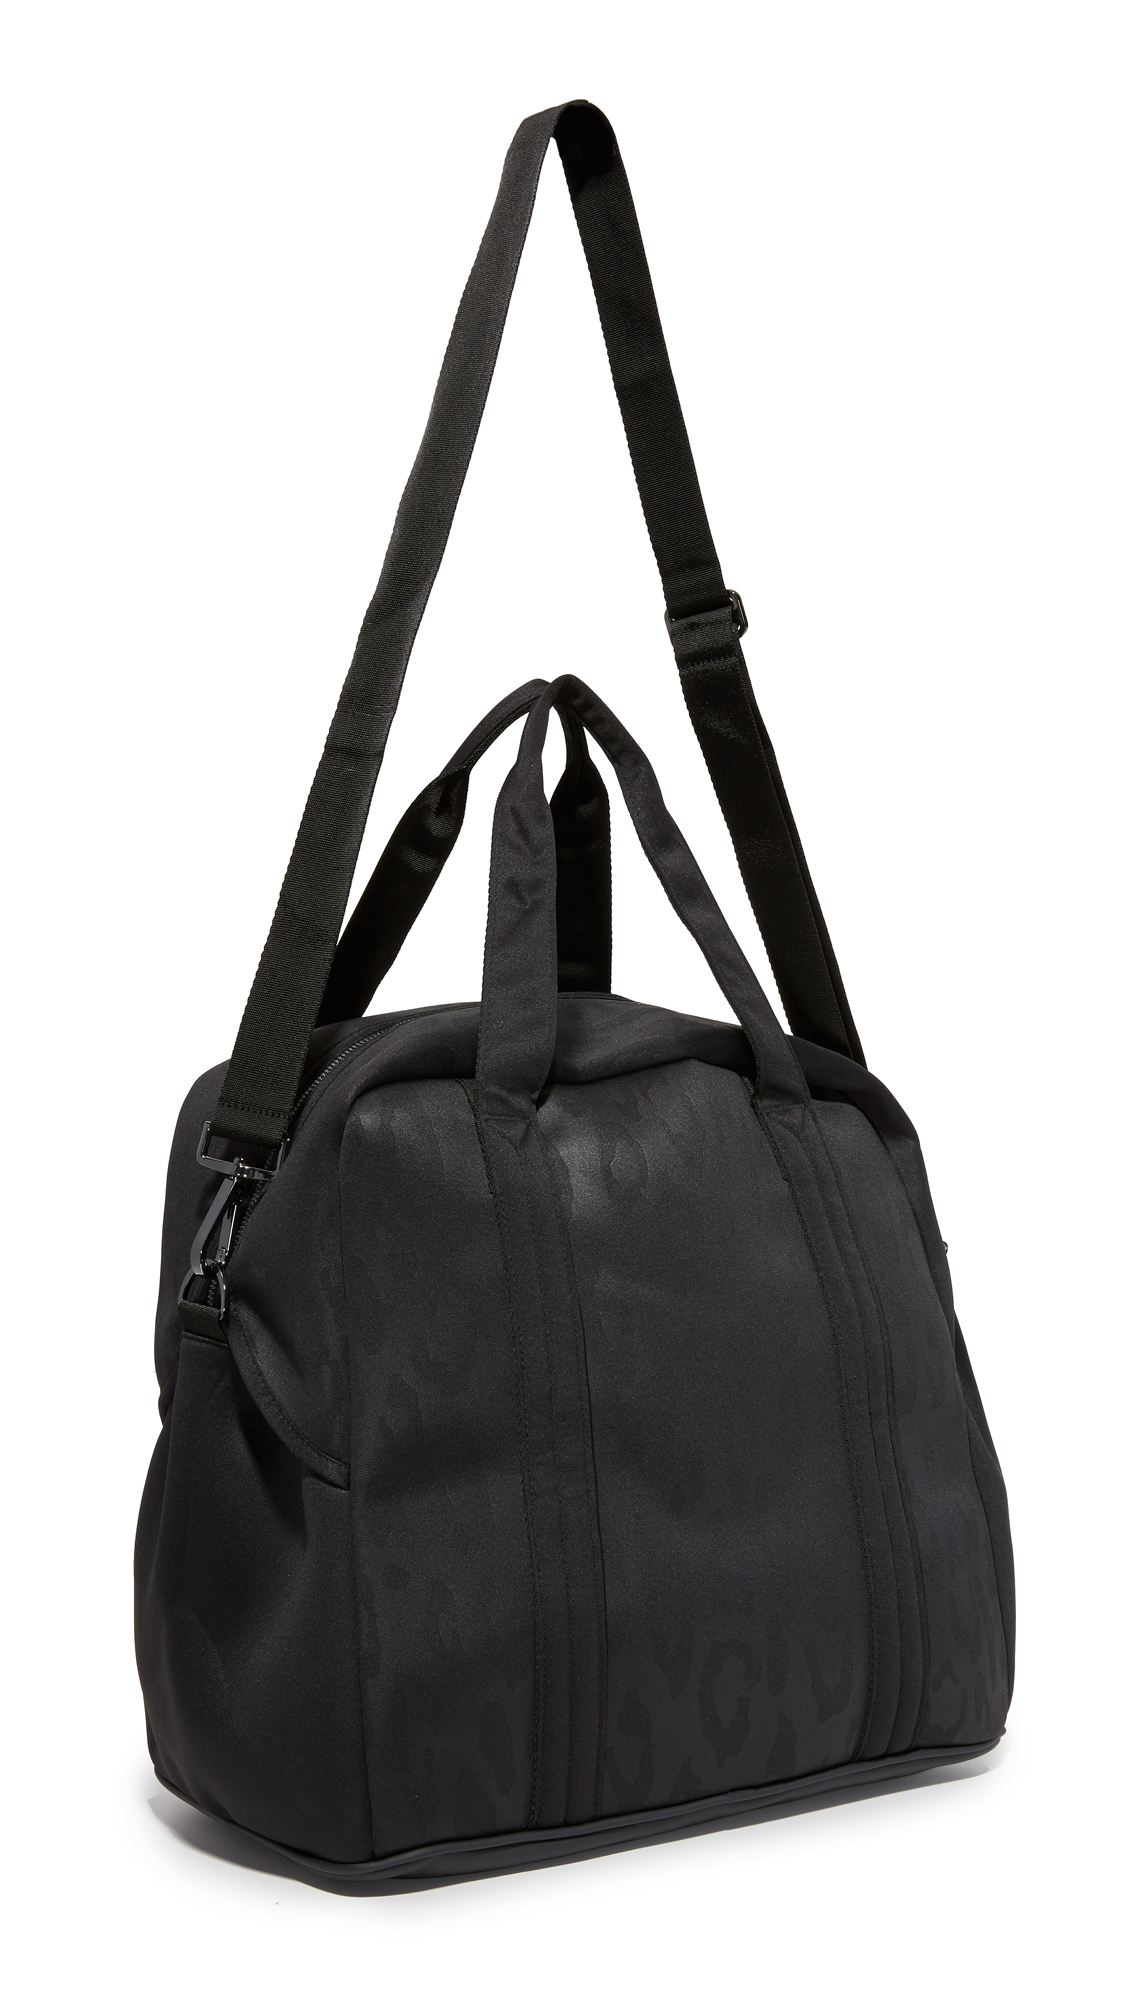 Stella Mccartney Adidas Shipshape Bag  e72922be3656b